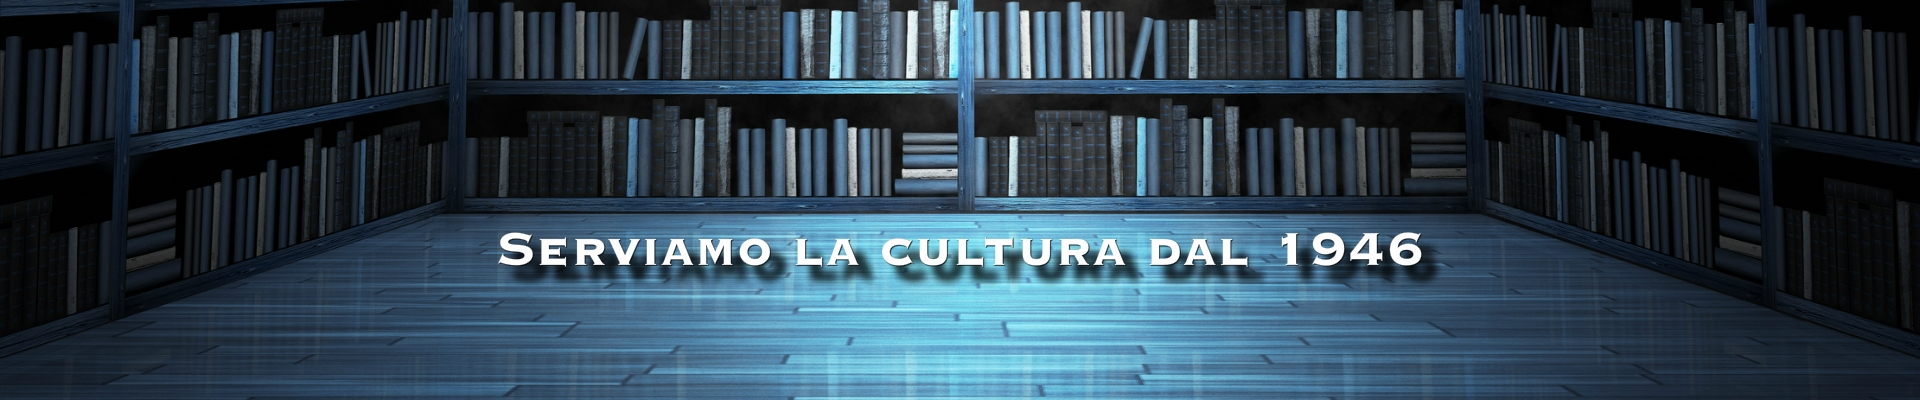 Ben noto Tirrenia srl forniture biblioteca etichette arredamento  YM89